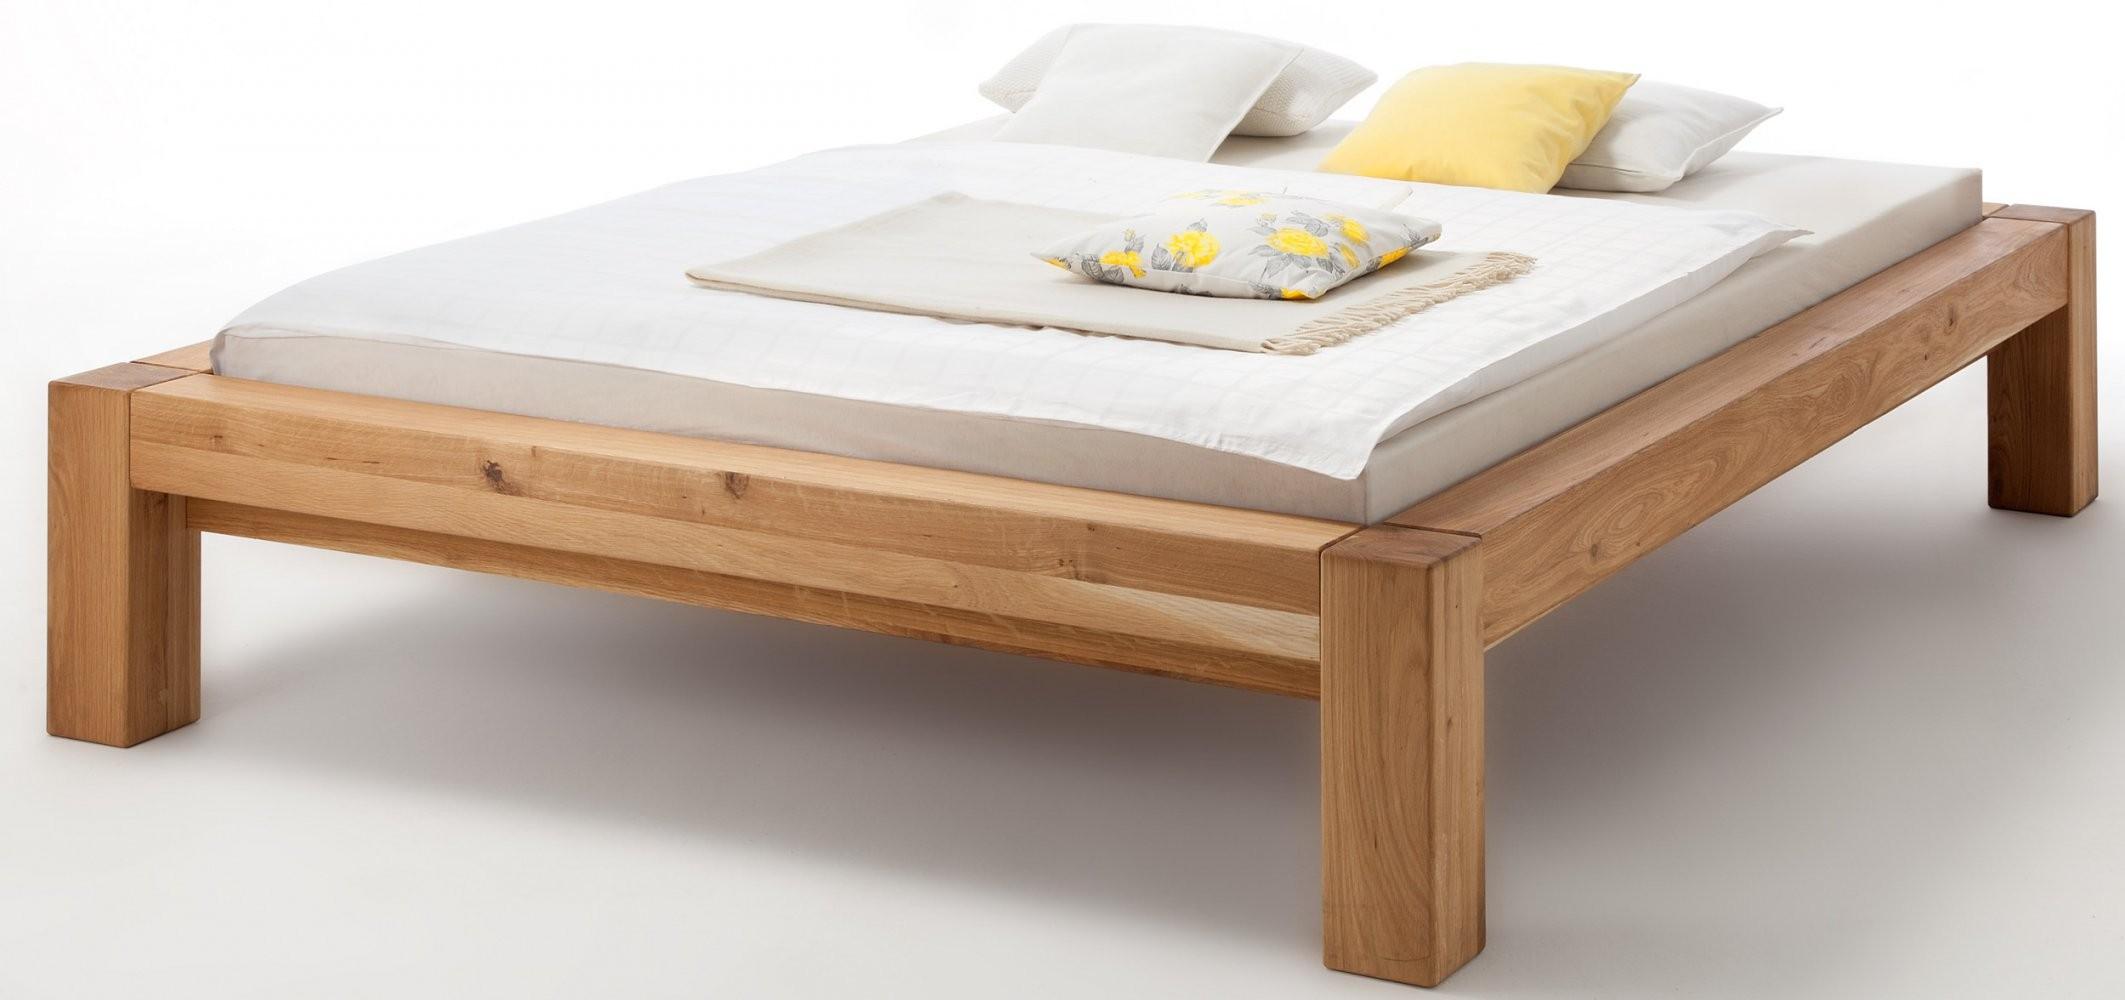 Bettgestell 140X200 Holz Beste Bett Massiv Massivholzbett Buche von Bettgestell Holz 140X200 Photo